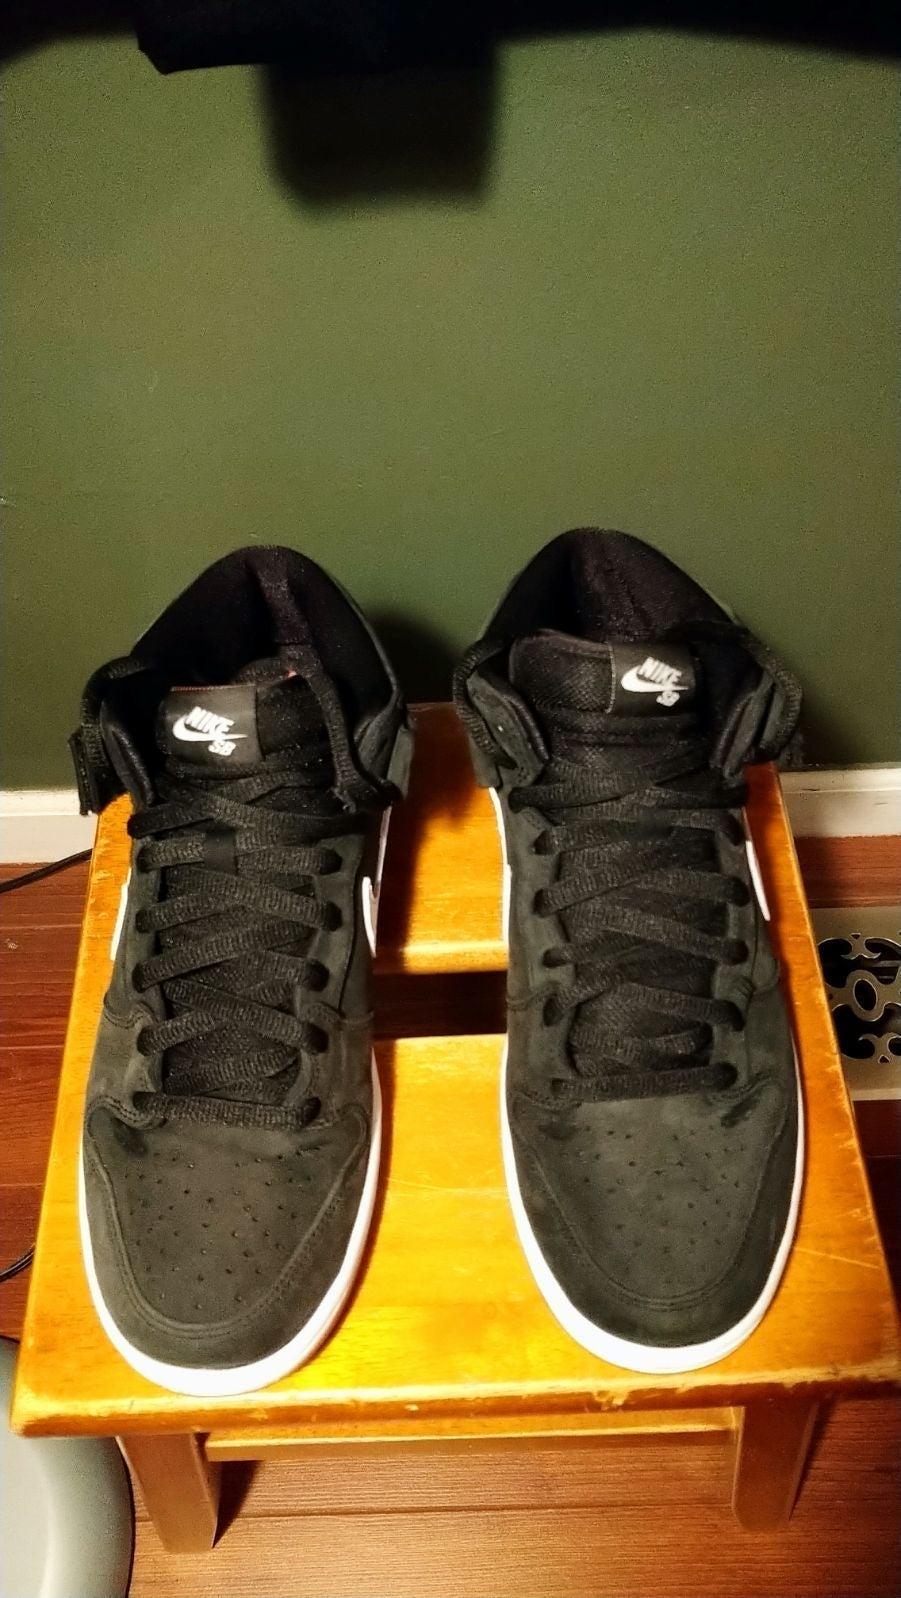 Nike SB Dunk Size 10